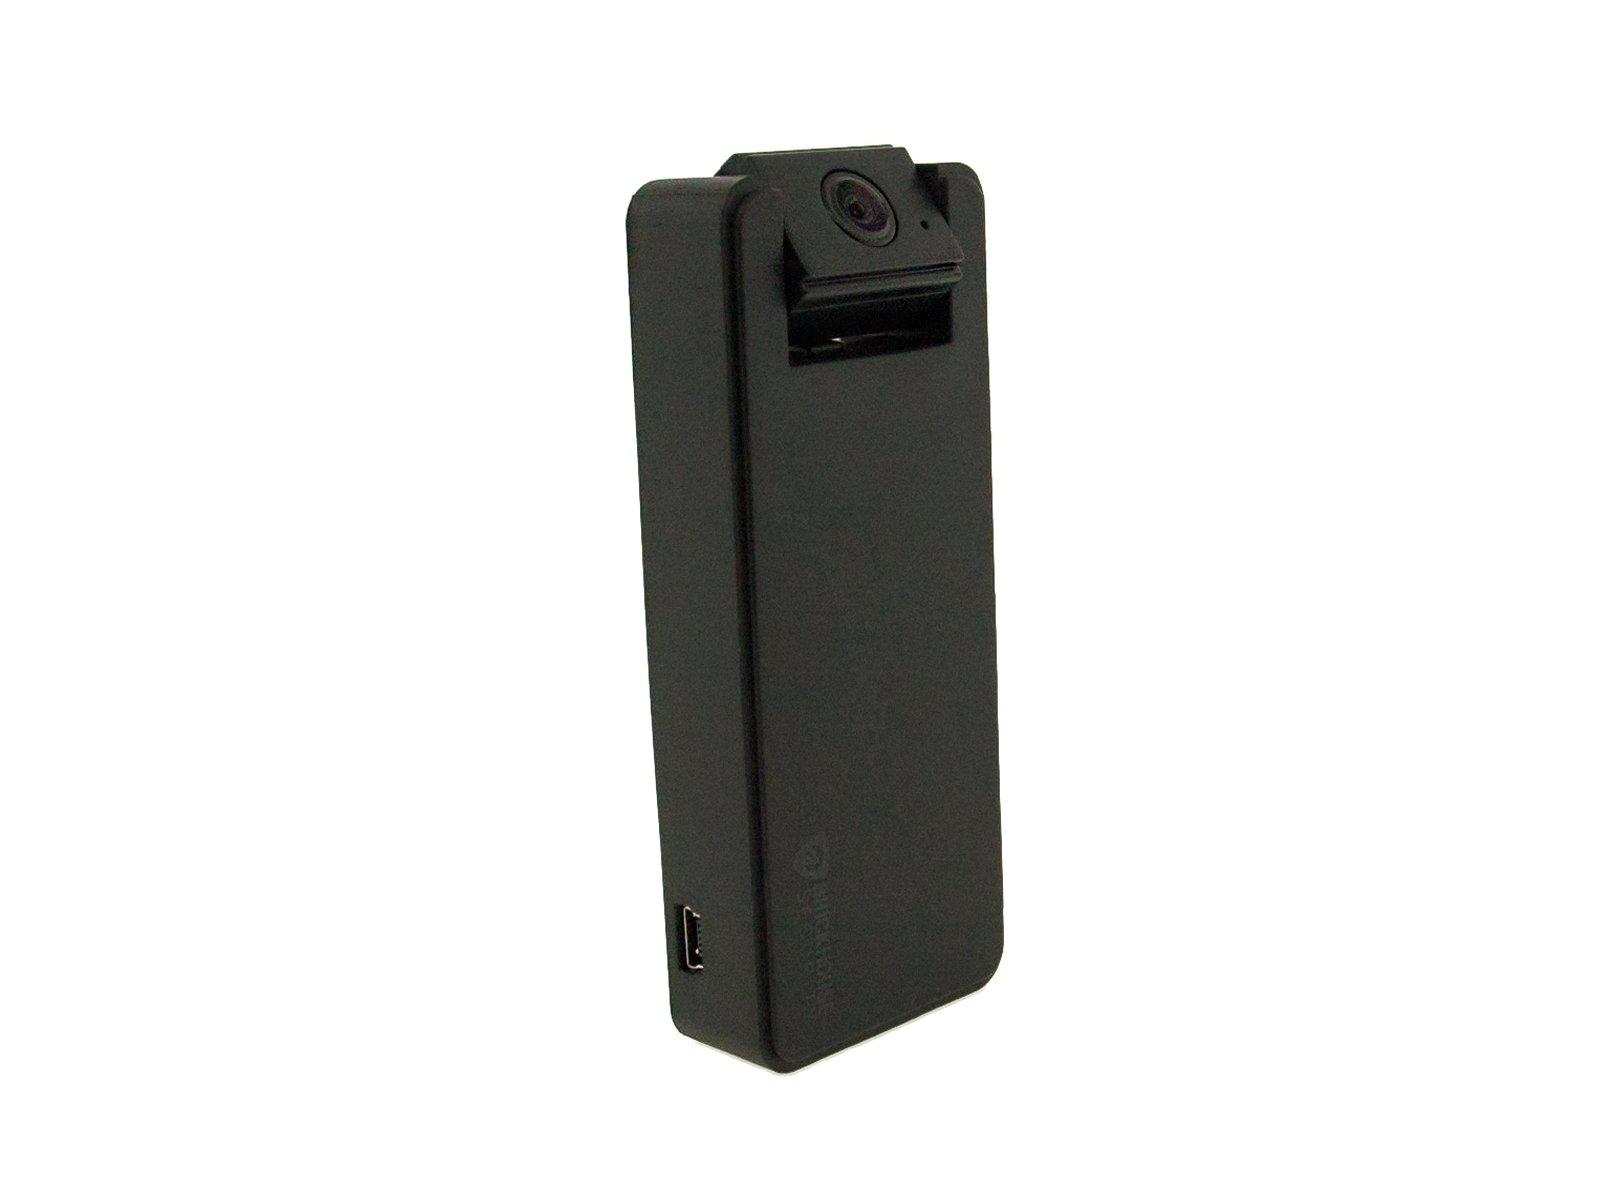 Brickhouse Security CAM-TILT Camscura Tilt 720p HD Hidden Camera, 160-Degree Adjustable Pivoting Wide Angle Lens